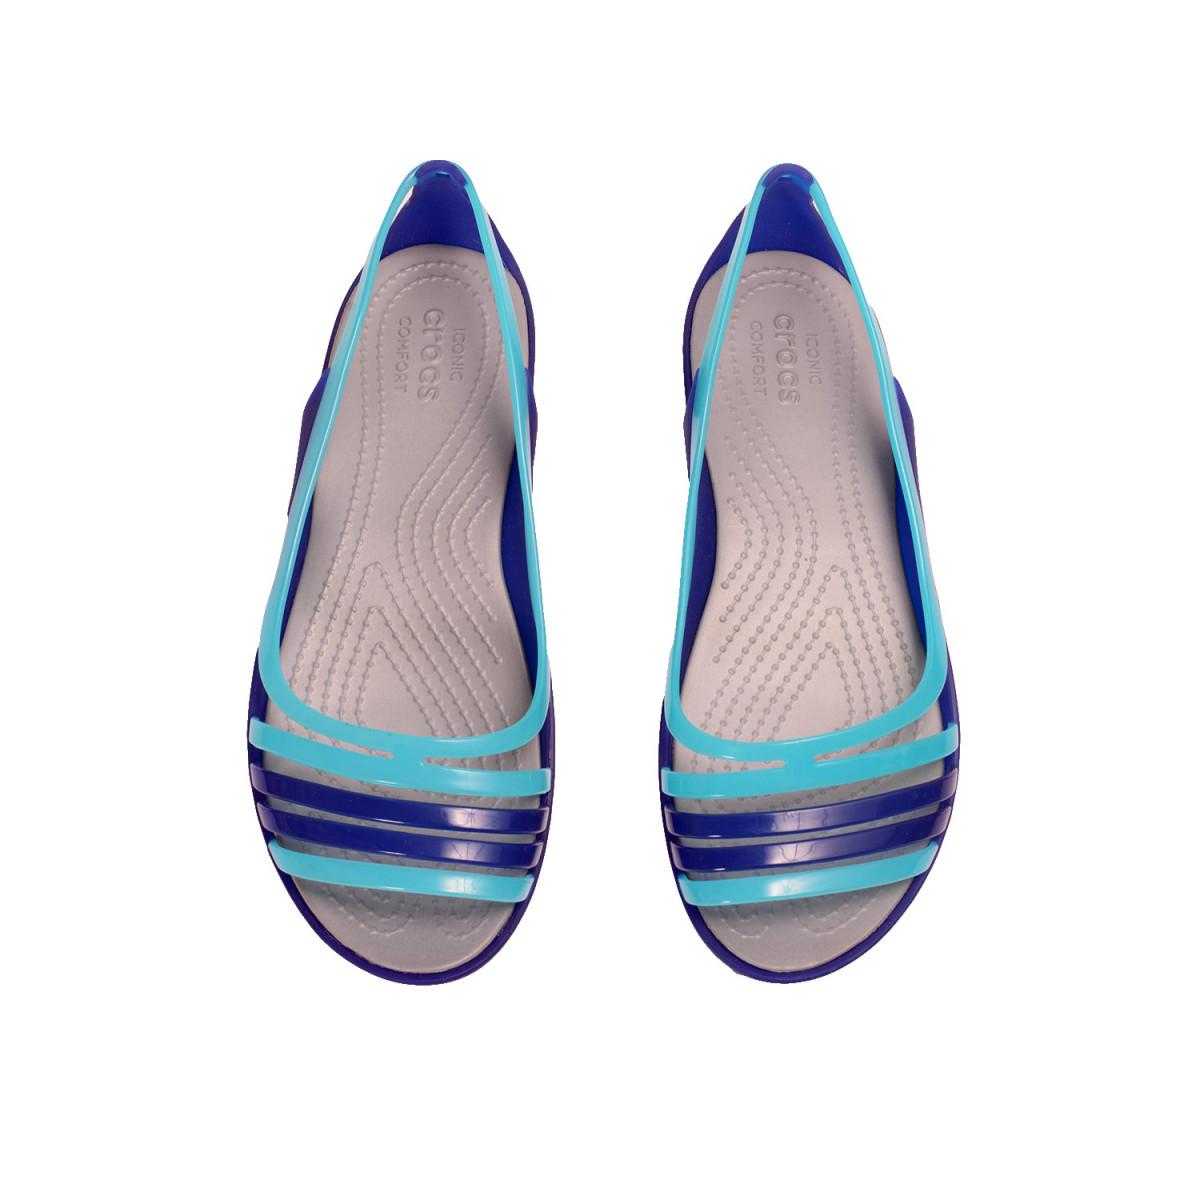 c1885905403 Sandalias Crocs Isabella Huarache Flat - Sandalias - Ojotas - Mujer